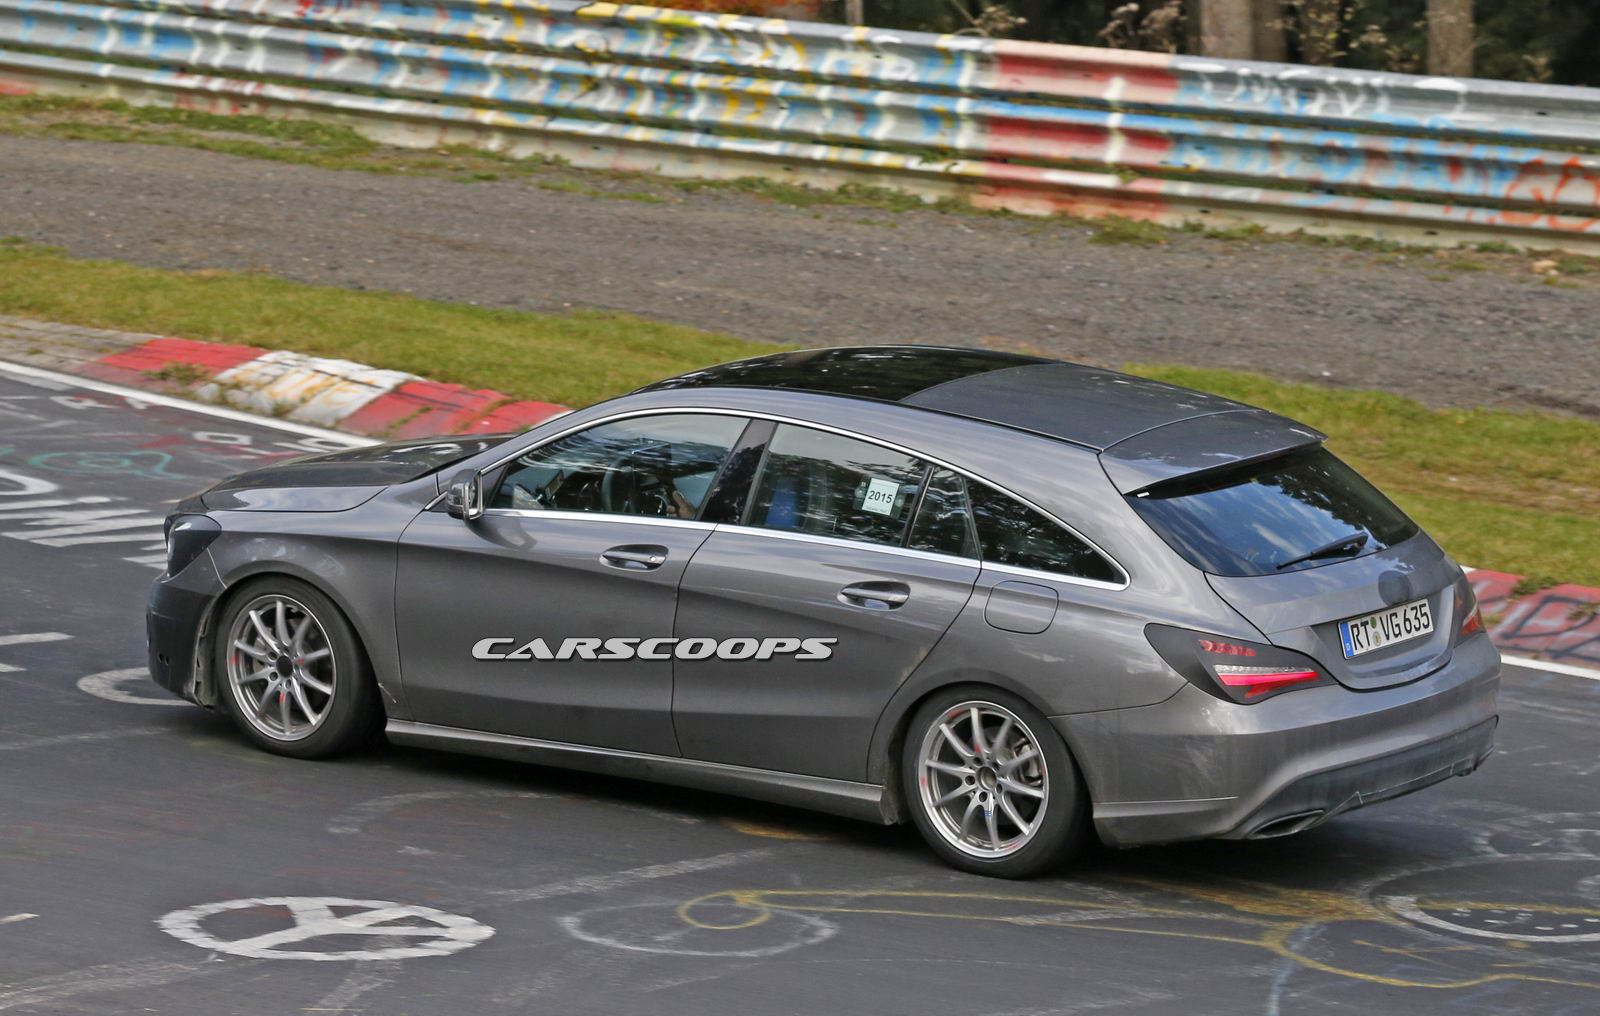 mercedes 39 revised cla shooting brake testing at the n rburgring carscoops. Black Bedroom Furniture Sets. Home Design Ideas